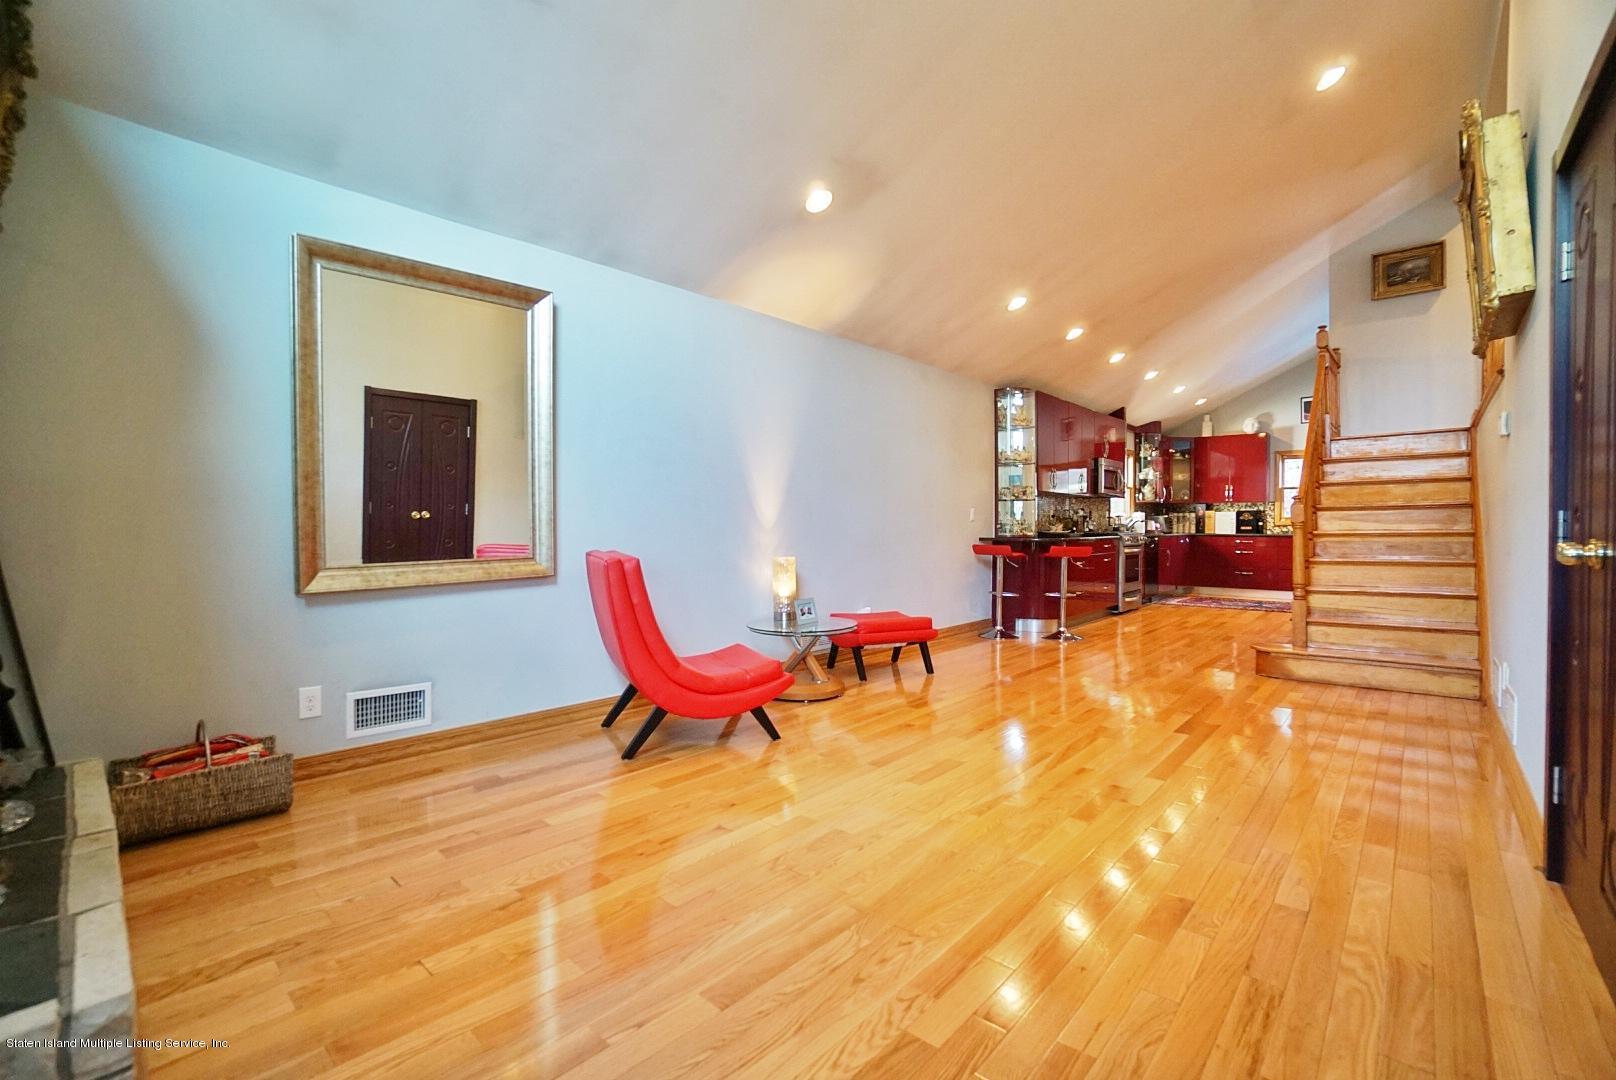 Single Family - Detached 48 Ocean Terrace  Staten Island, NY 10314, MLS-1130826-9